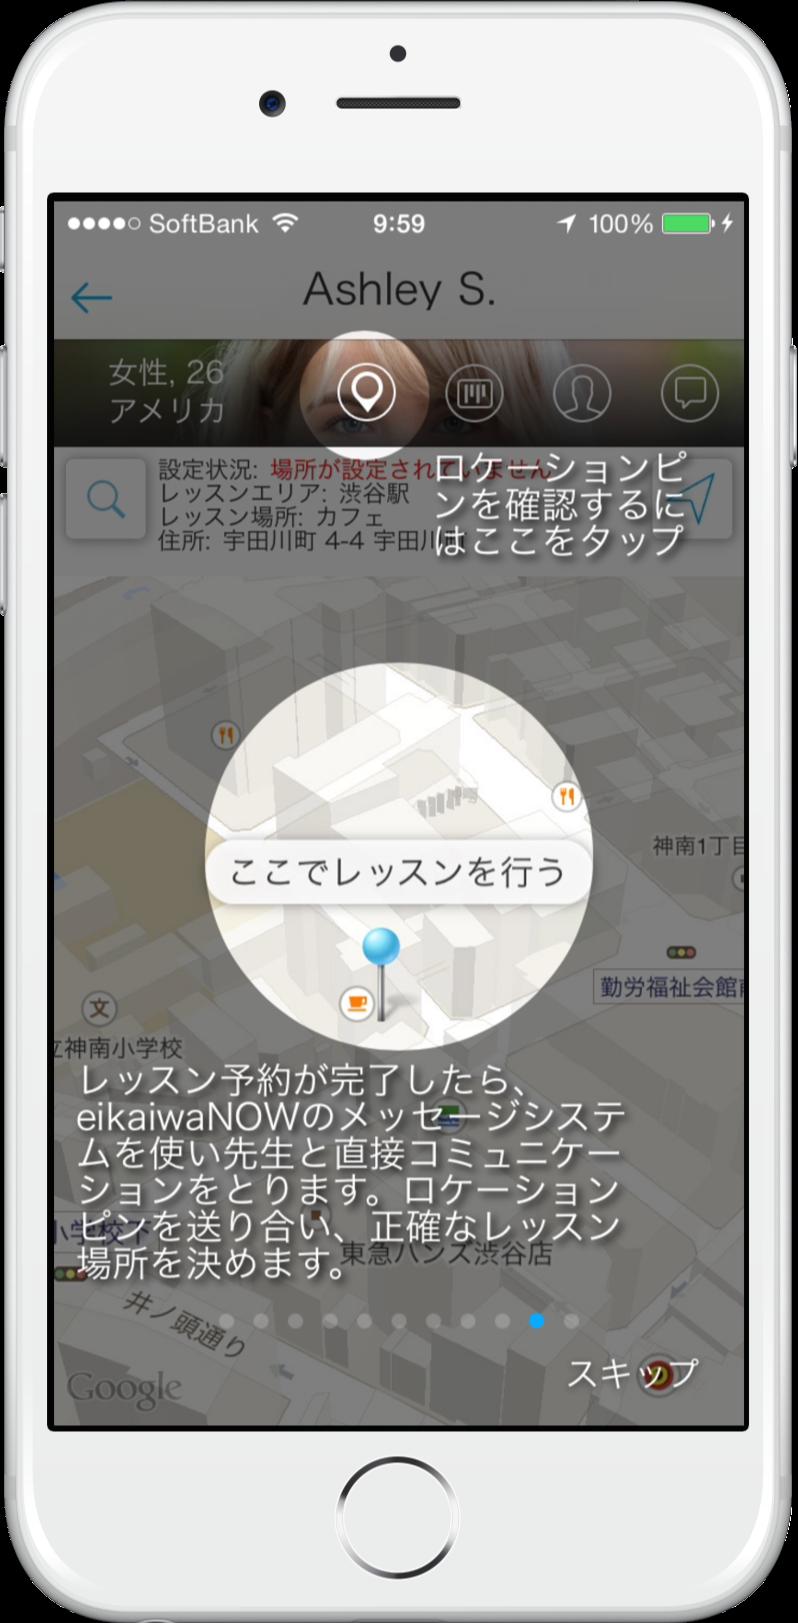 eikaiwaNOW - レッスンの流れ - JPN - 9_iphone6_silver_portrait.png